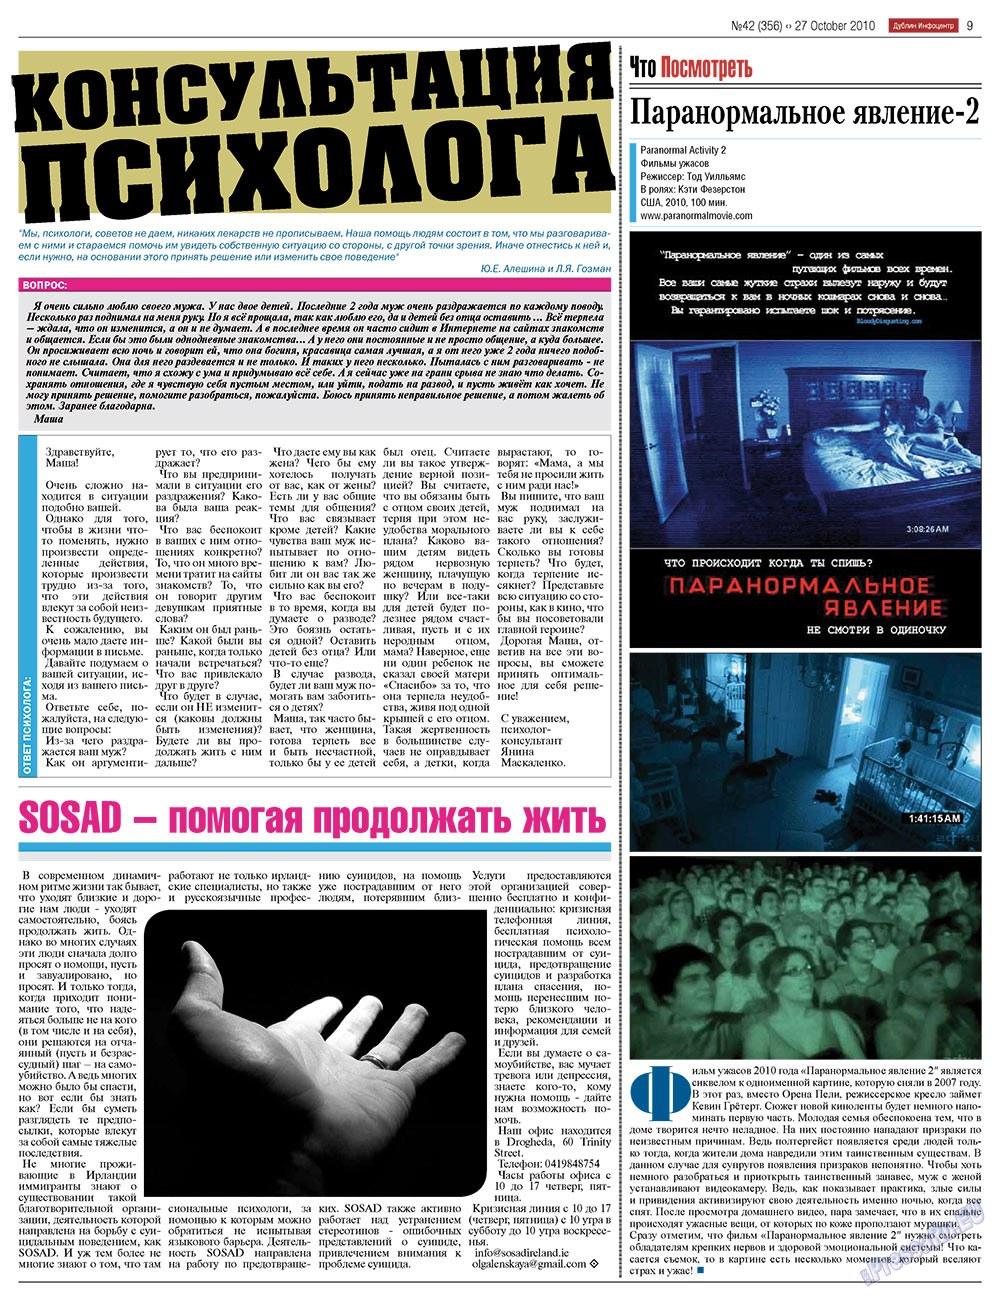 Дублин инфоцентр (газета). 2010 год, номер 42, стр. 9